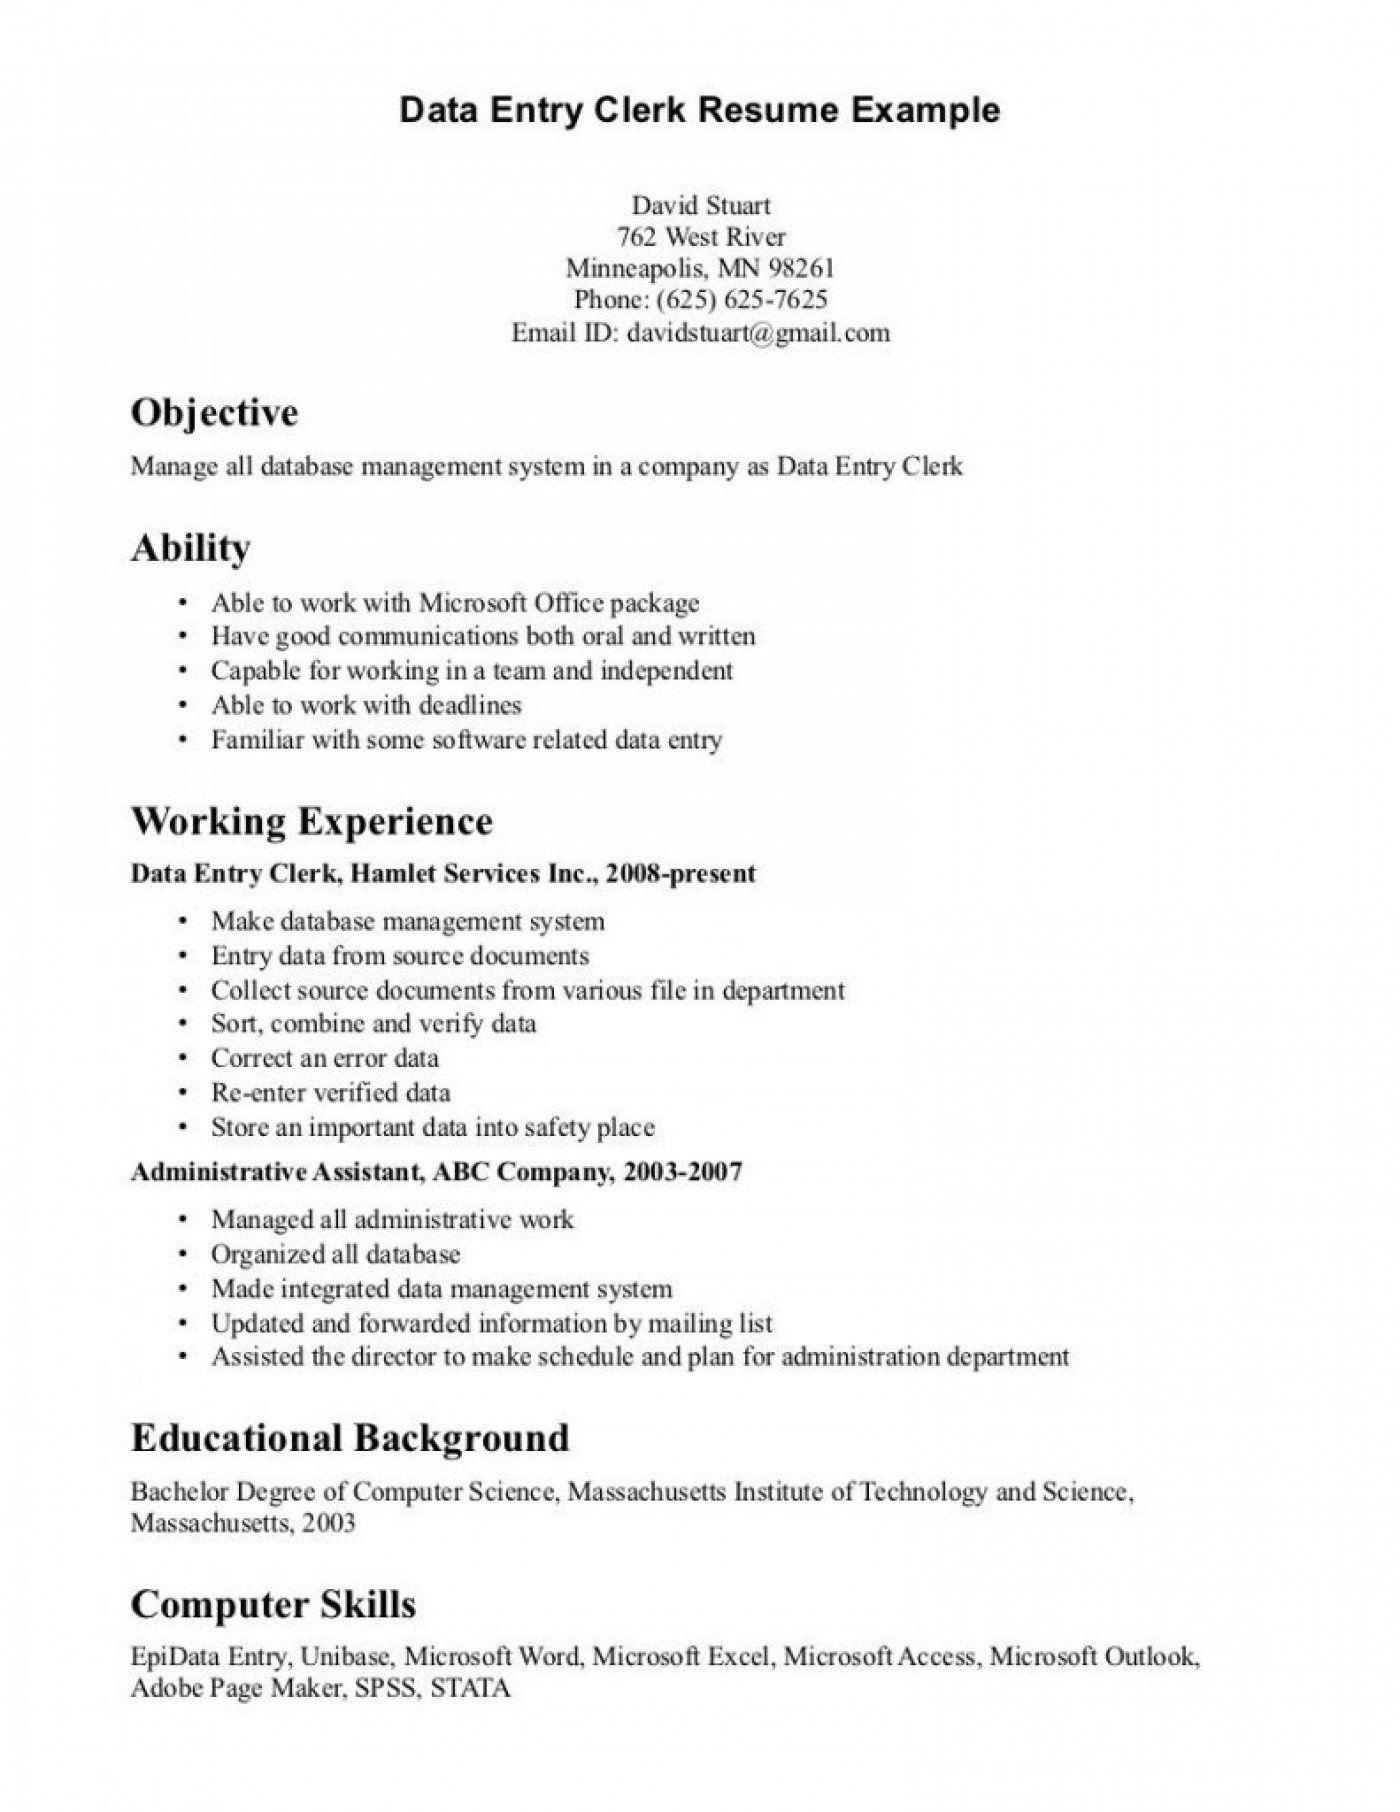 Data Entry Clerk Resume Data Entry Clerk Resume Sample Professional Data Entry Clerk Data Entry Clerk Sample Resume Templates Resume Objective